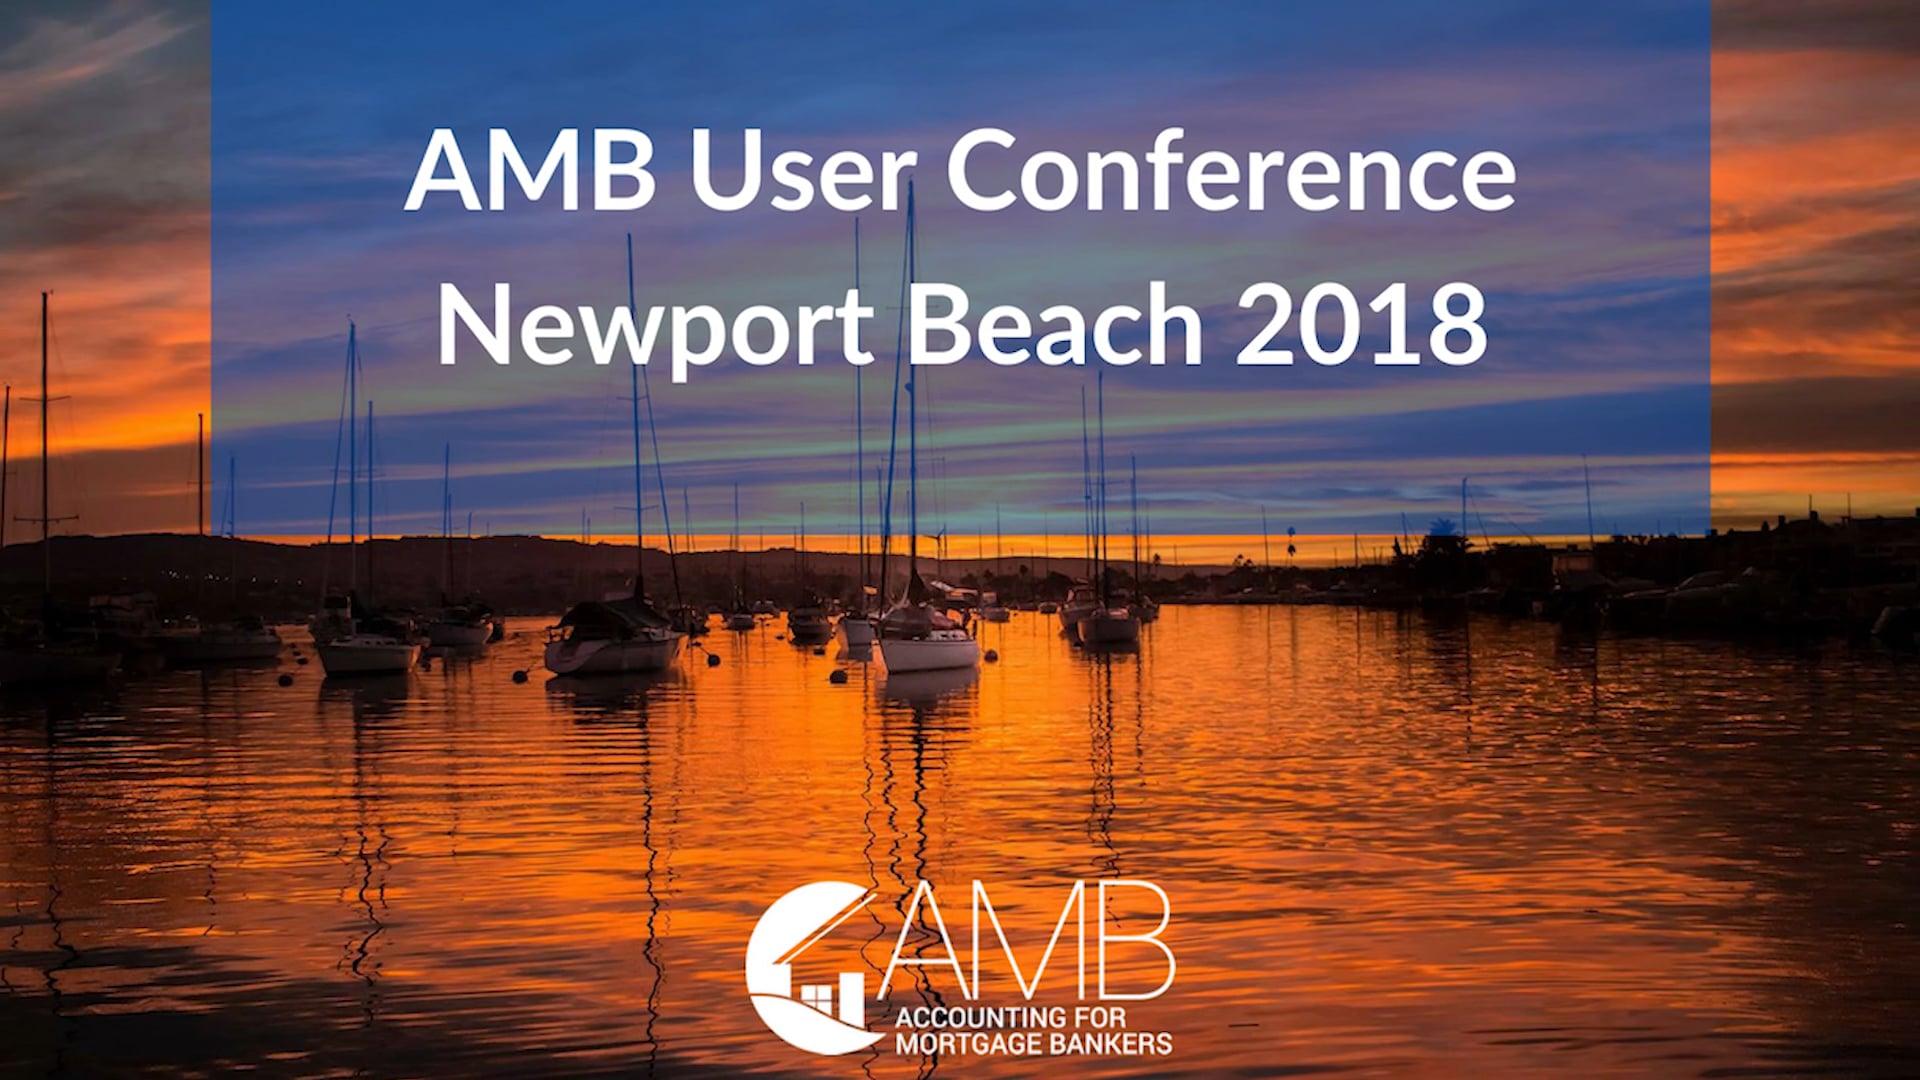 AMB User Conference Newport Beach 2018